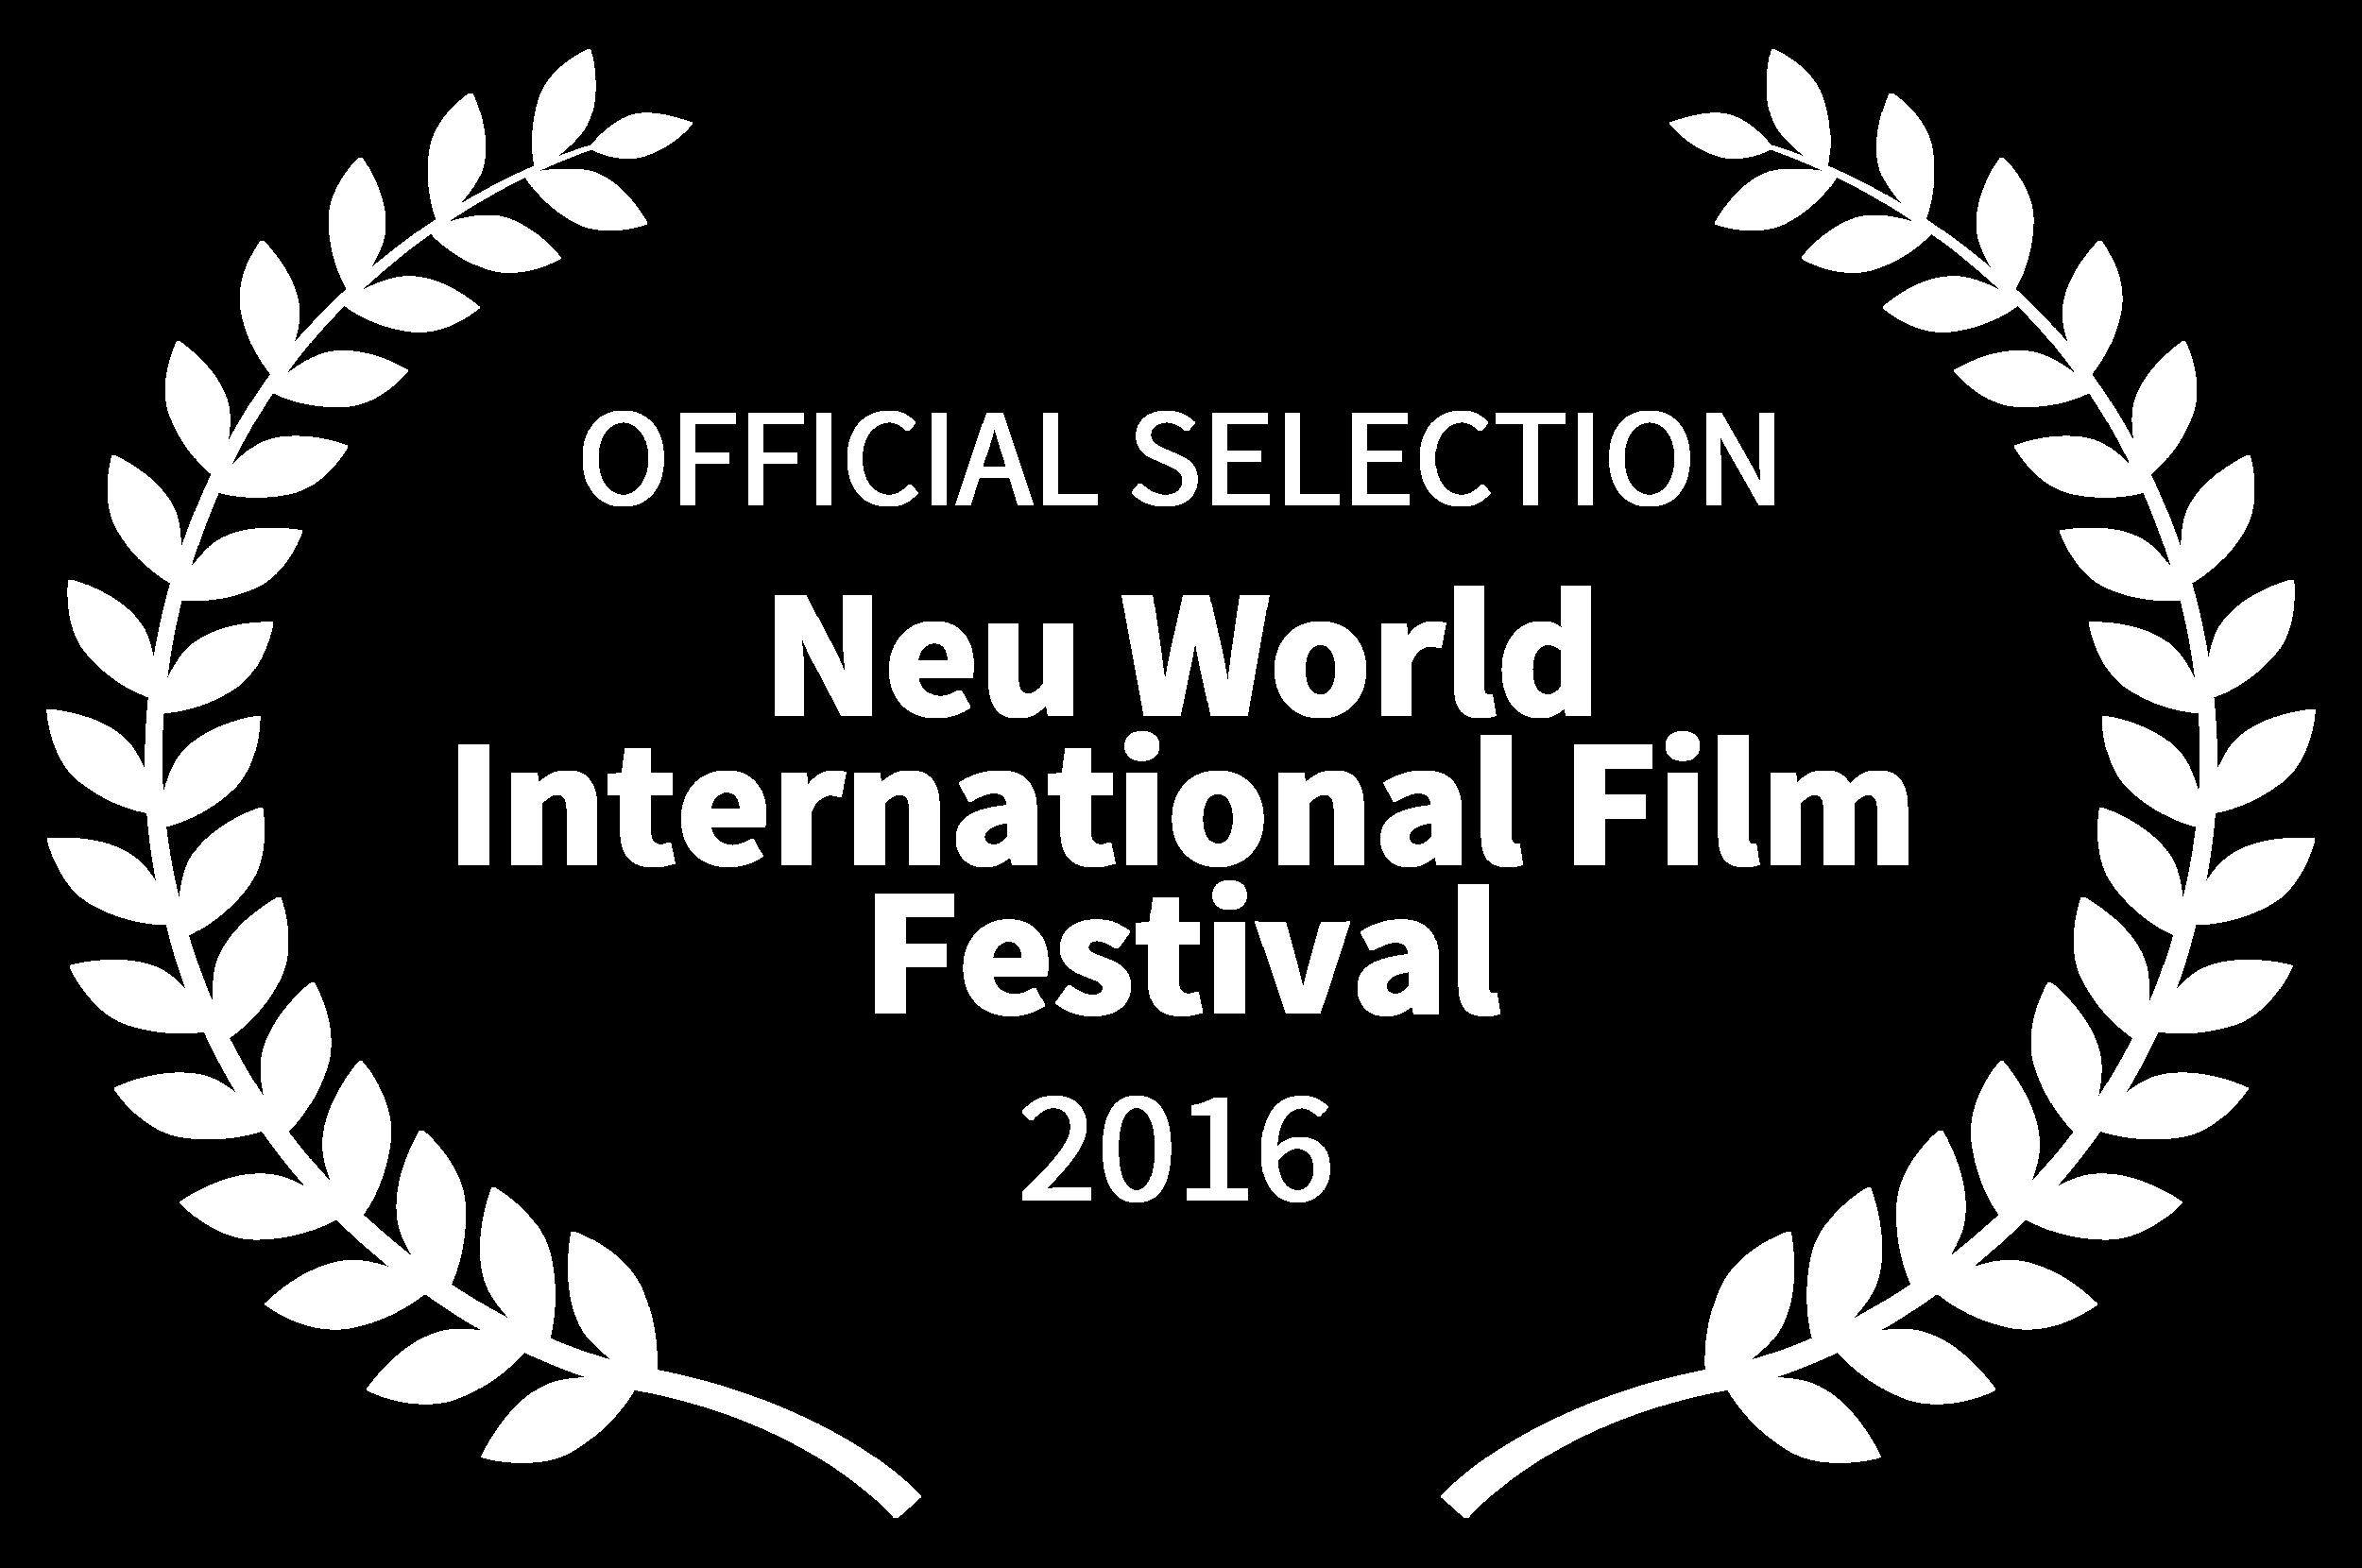 OFFICIALSELECTION-NeuWorldInternationalFilmFestival-2016 copy.png